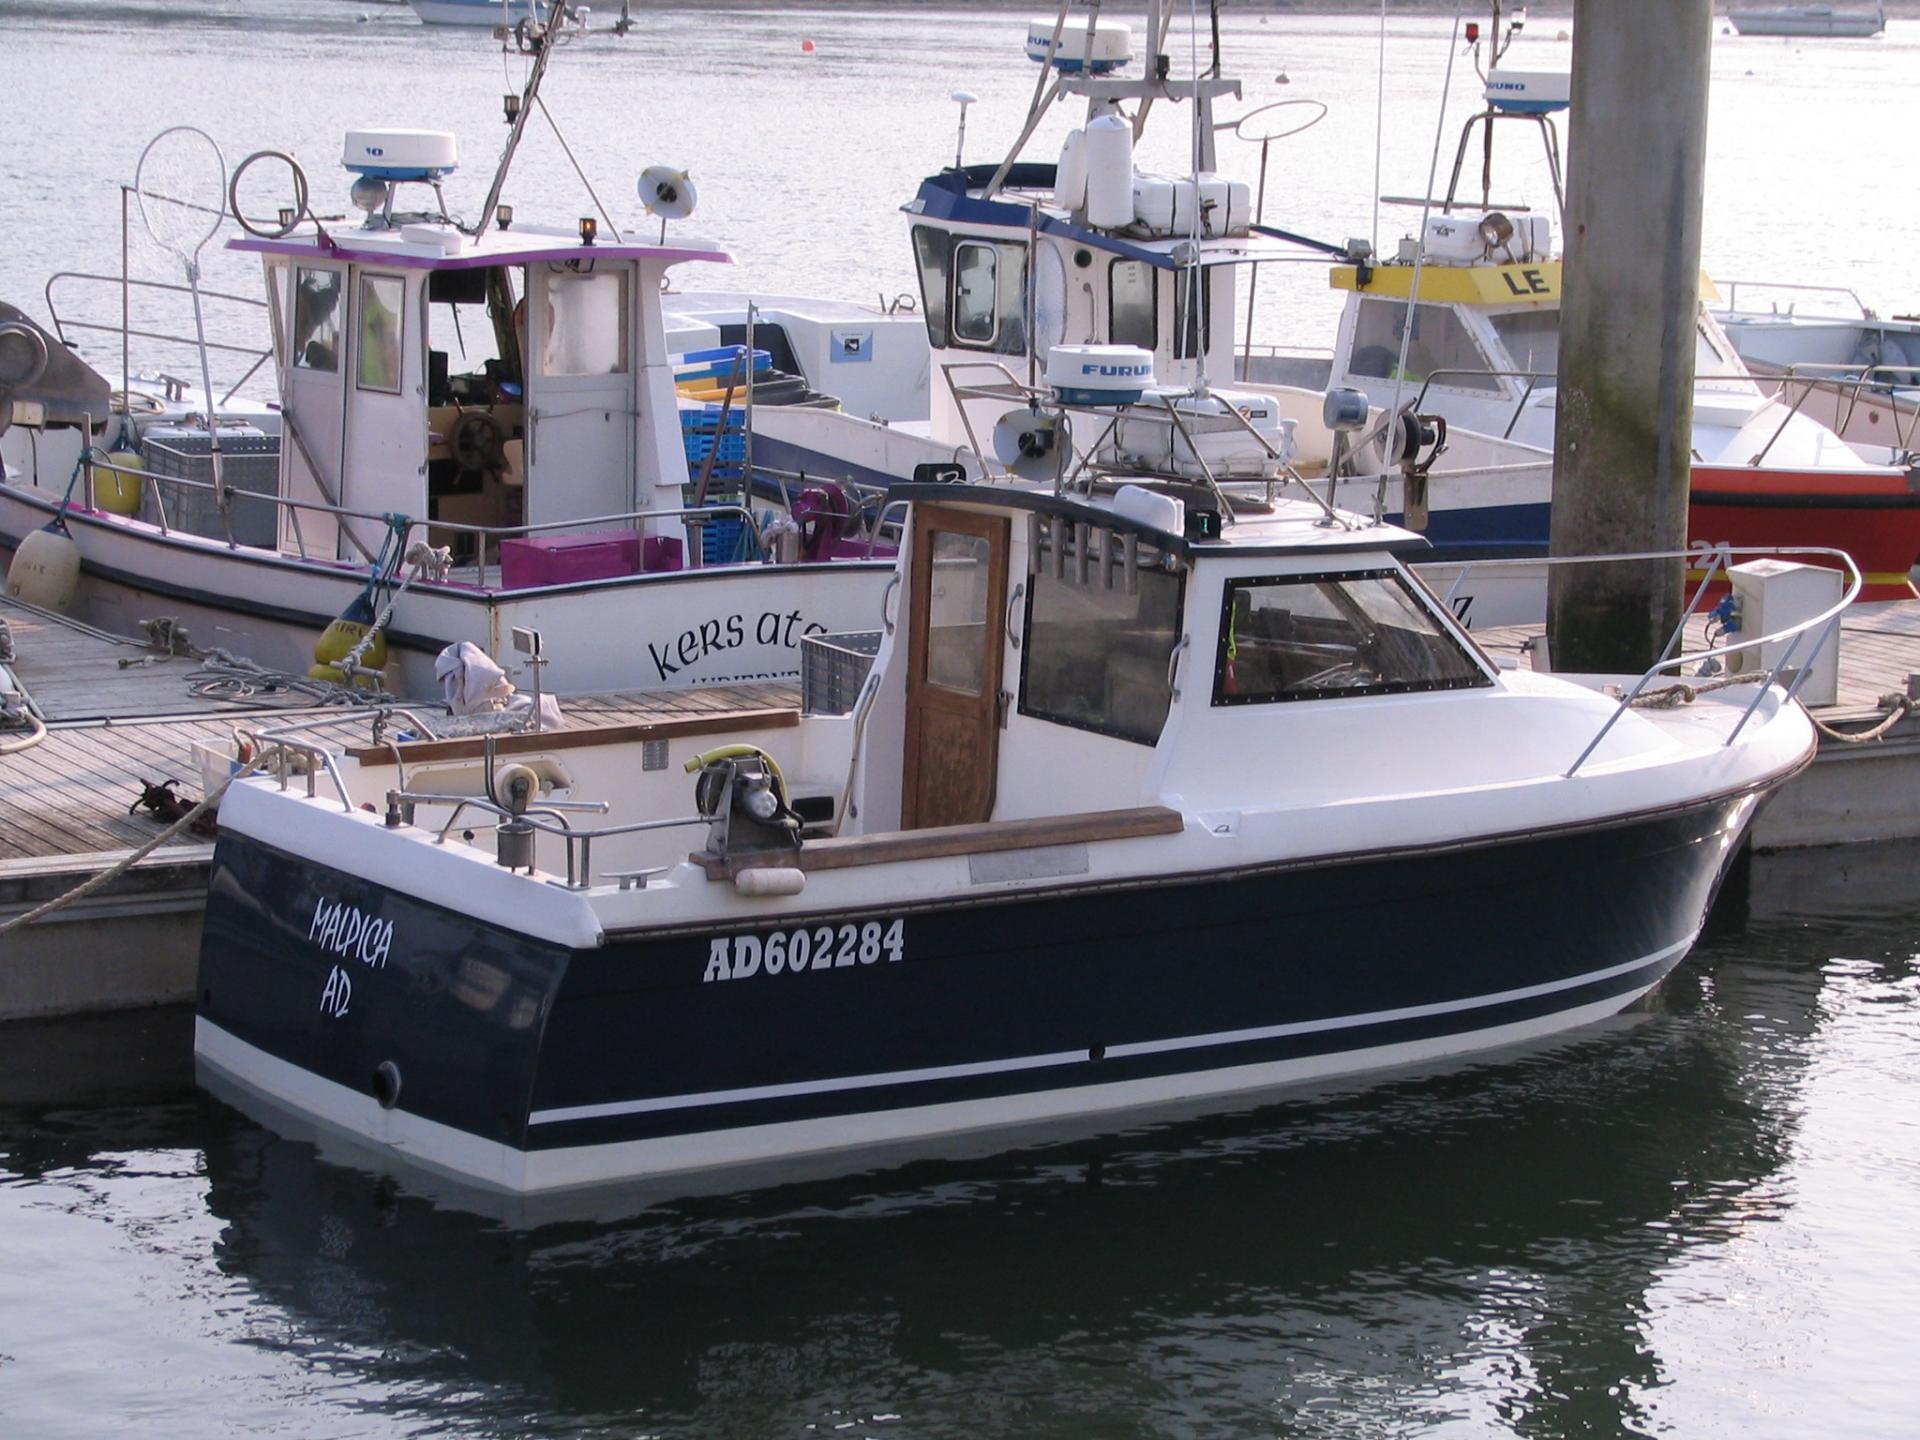 200328 malpica ponton d